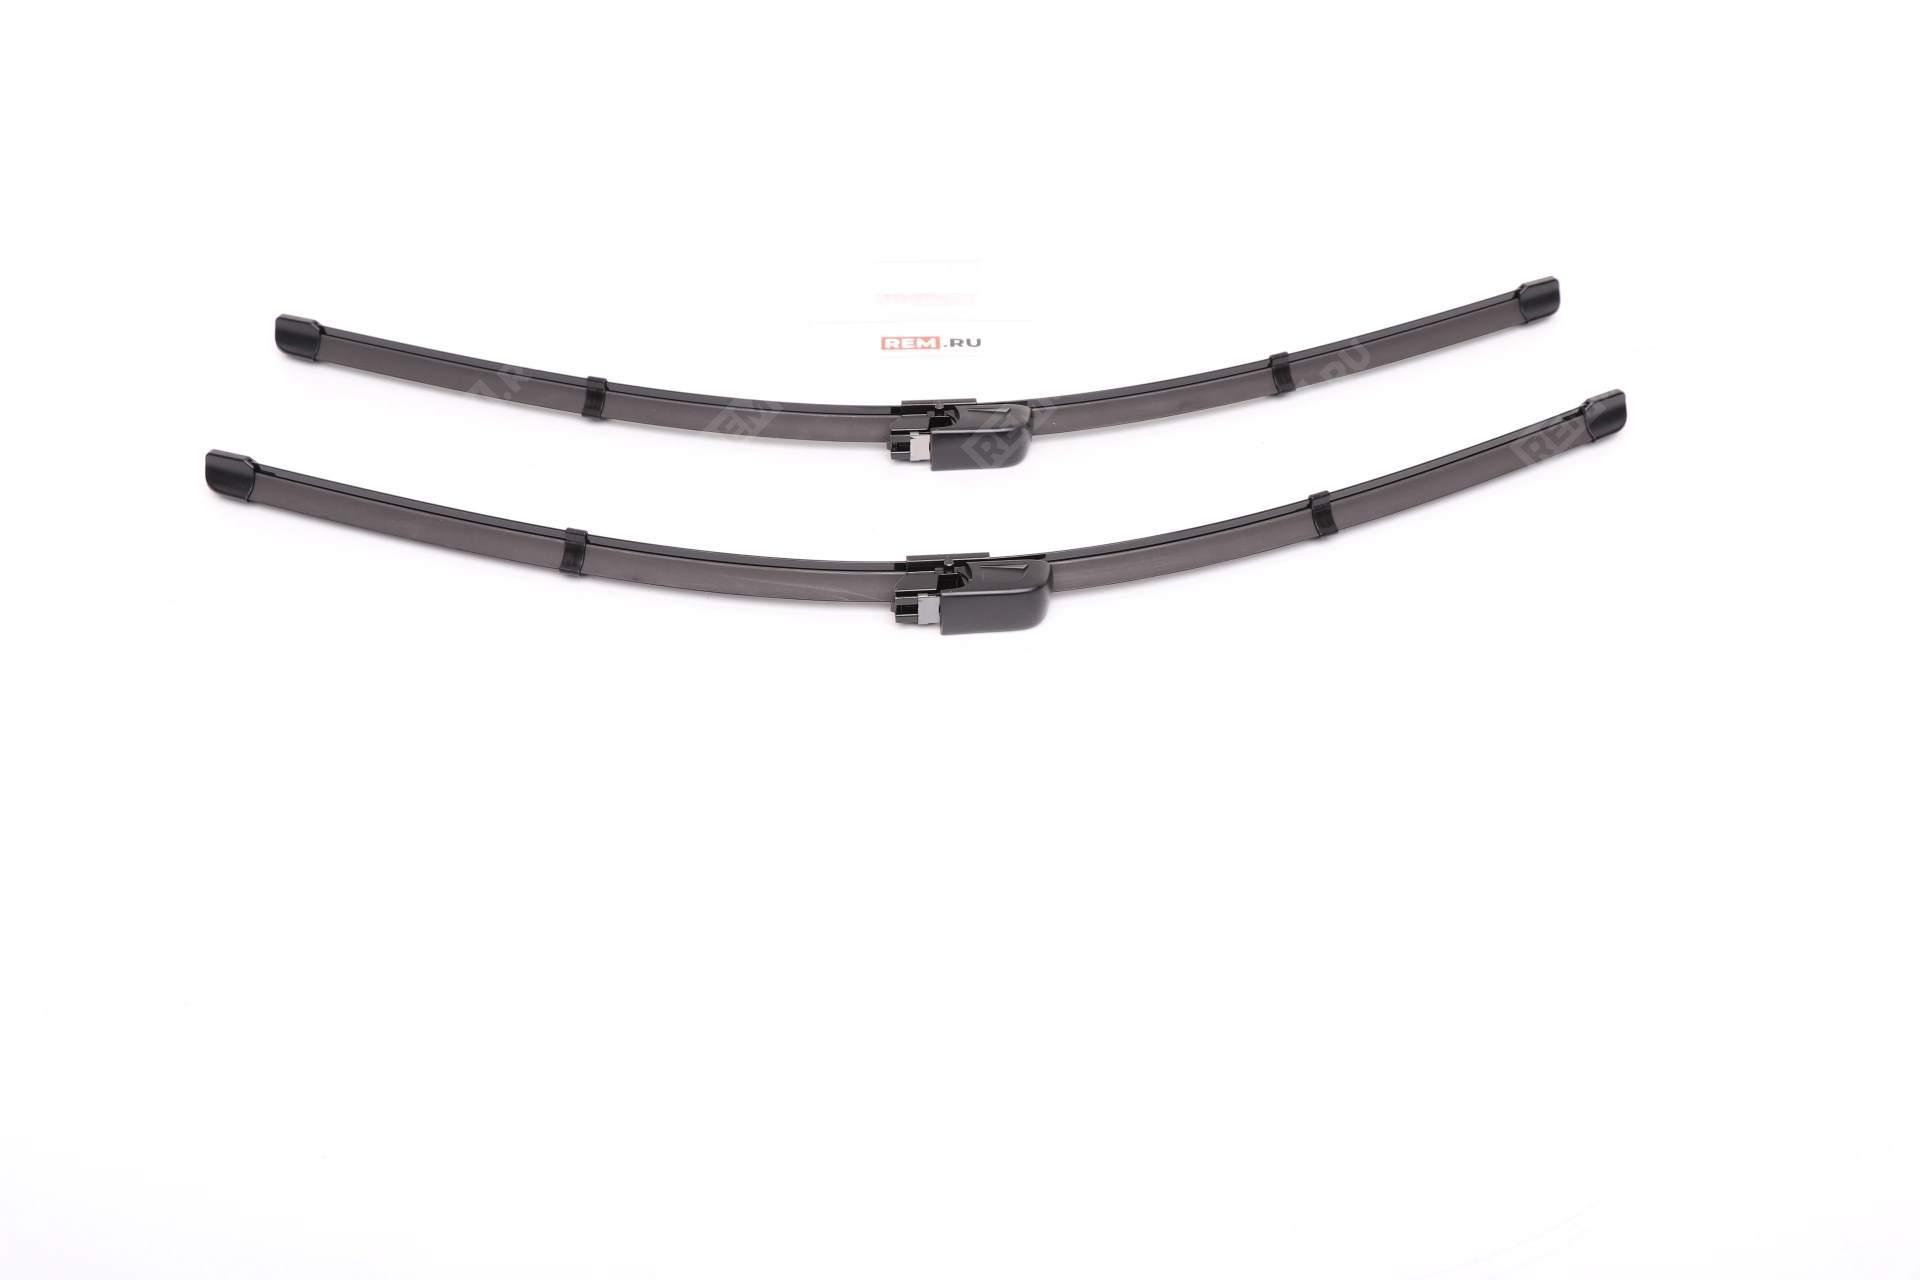 Комплект щеток стеклоочистителя Audi 4E0998002